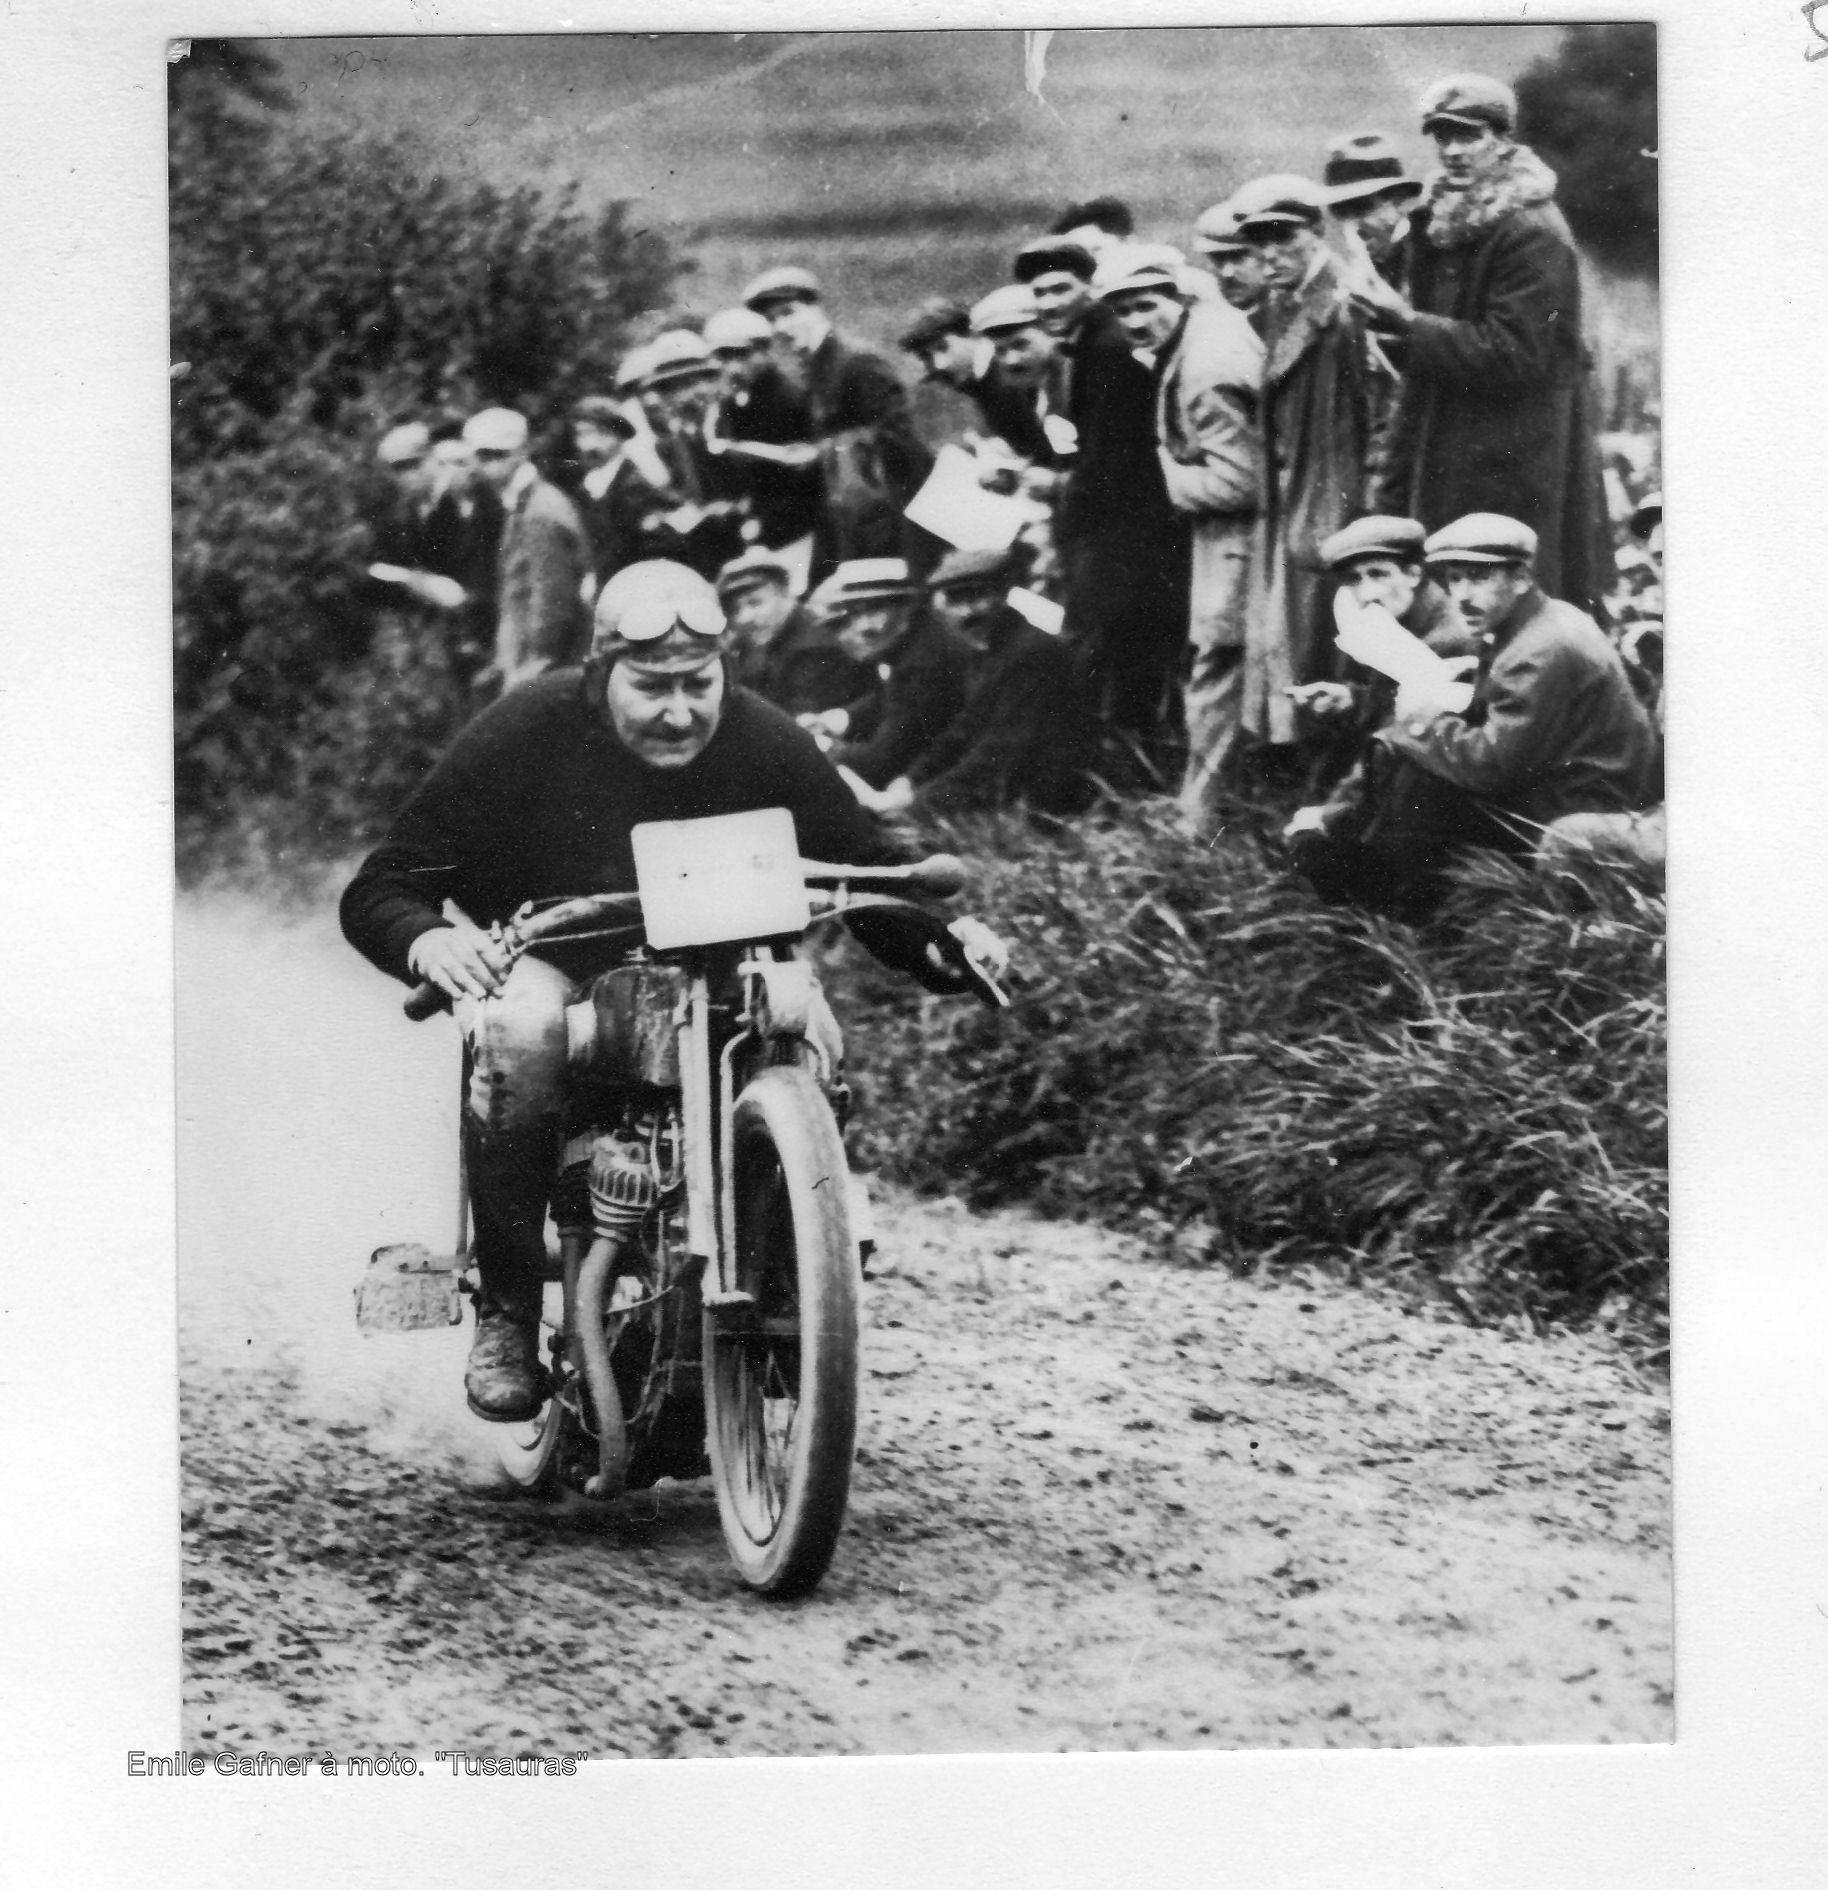 motos photos d'époque 1b3079d645d28f80